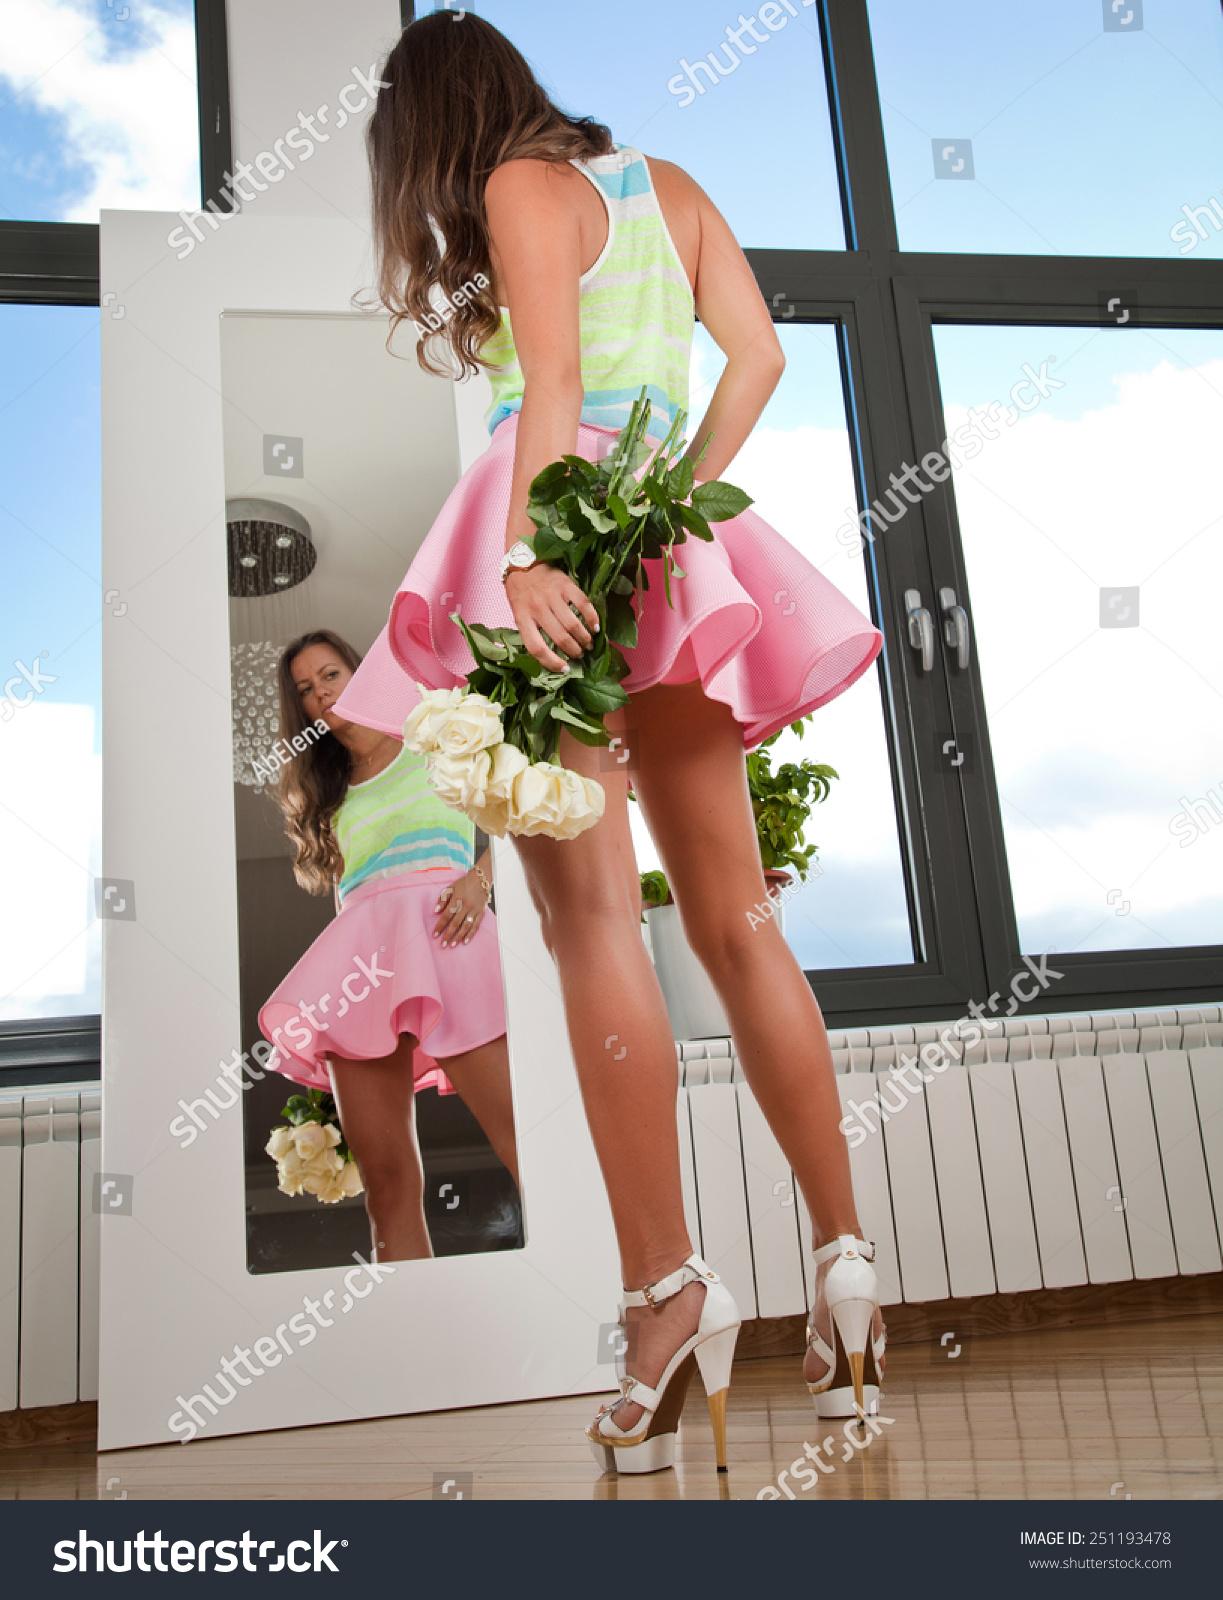 Miniskirts And High Heels